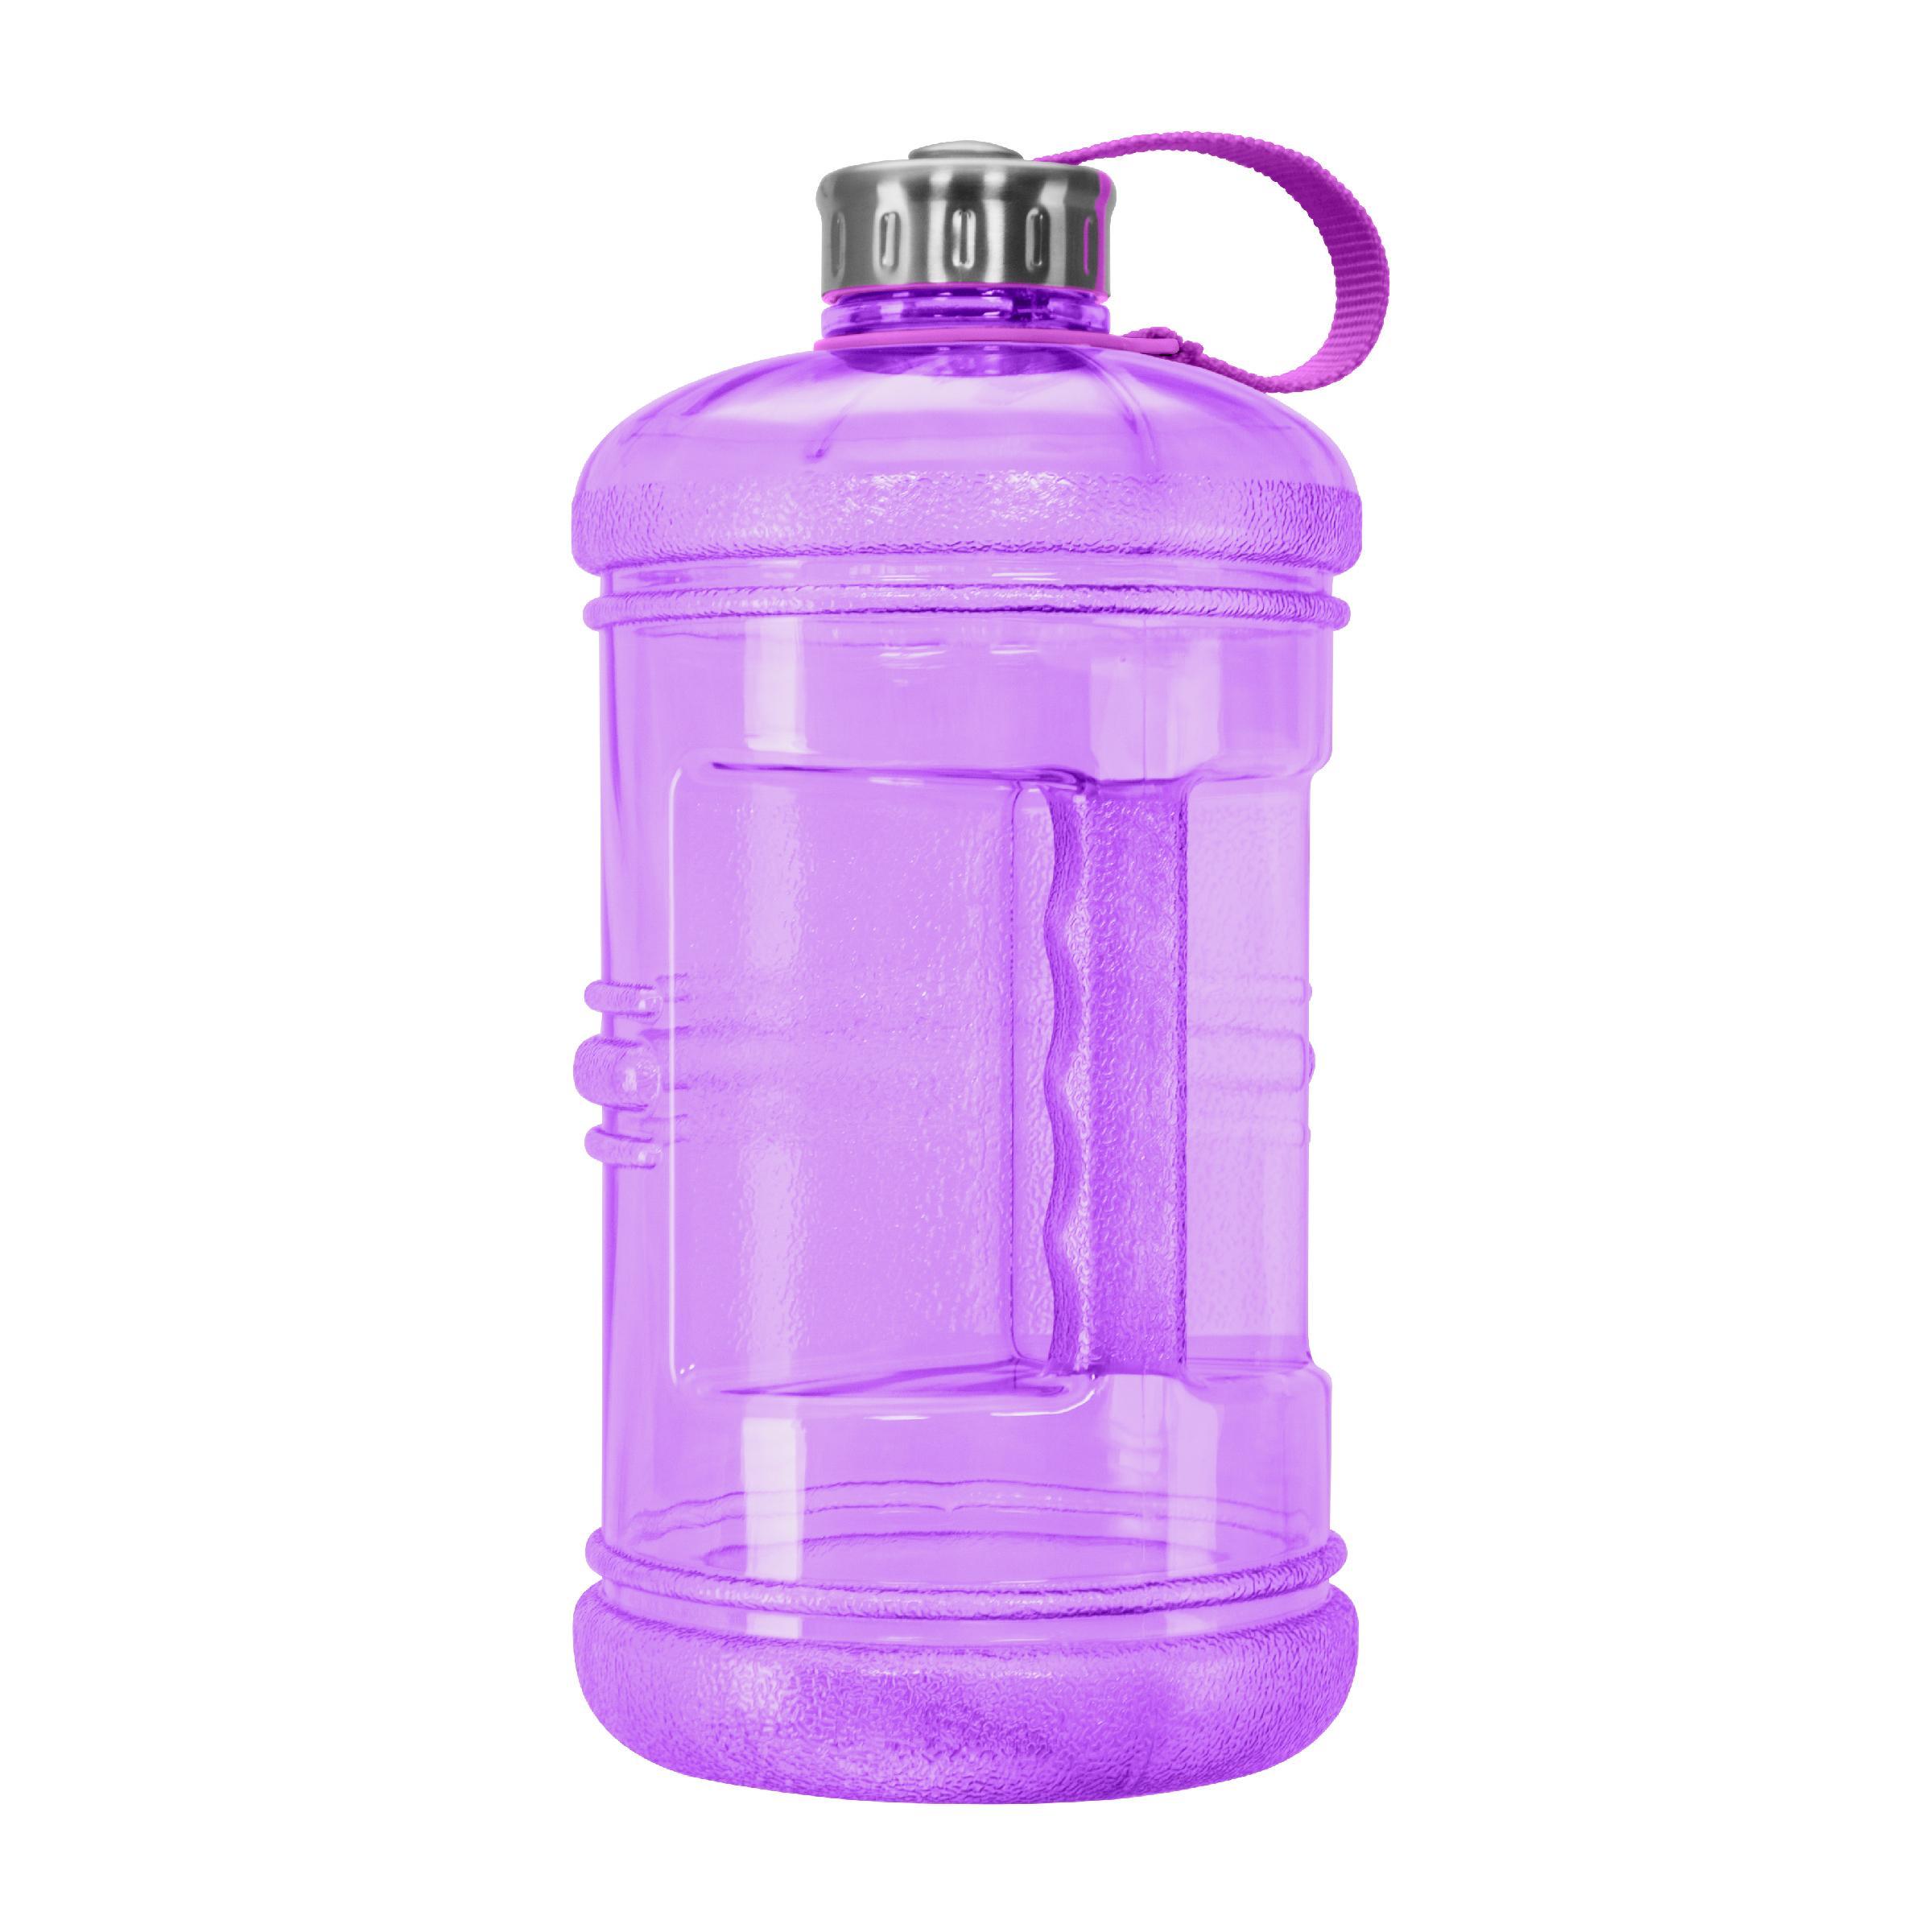 3 Liter BPA FREE Reusable Plastic Drinking Water Bottle w/ Steel Cap